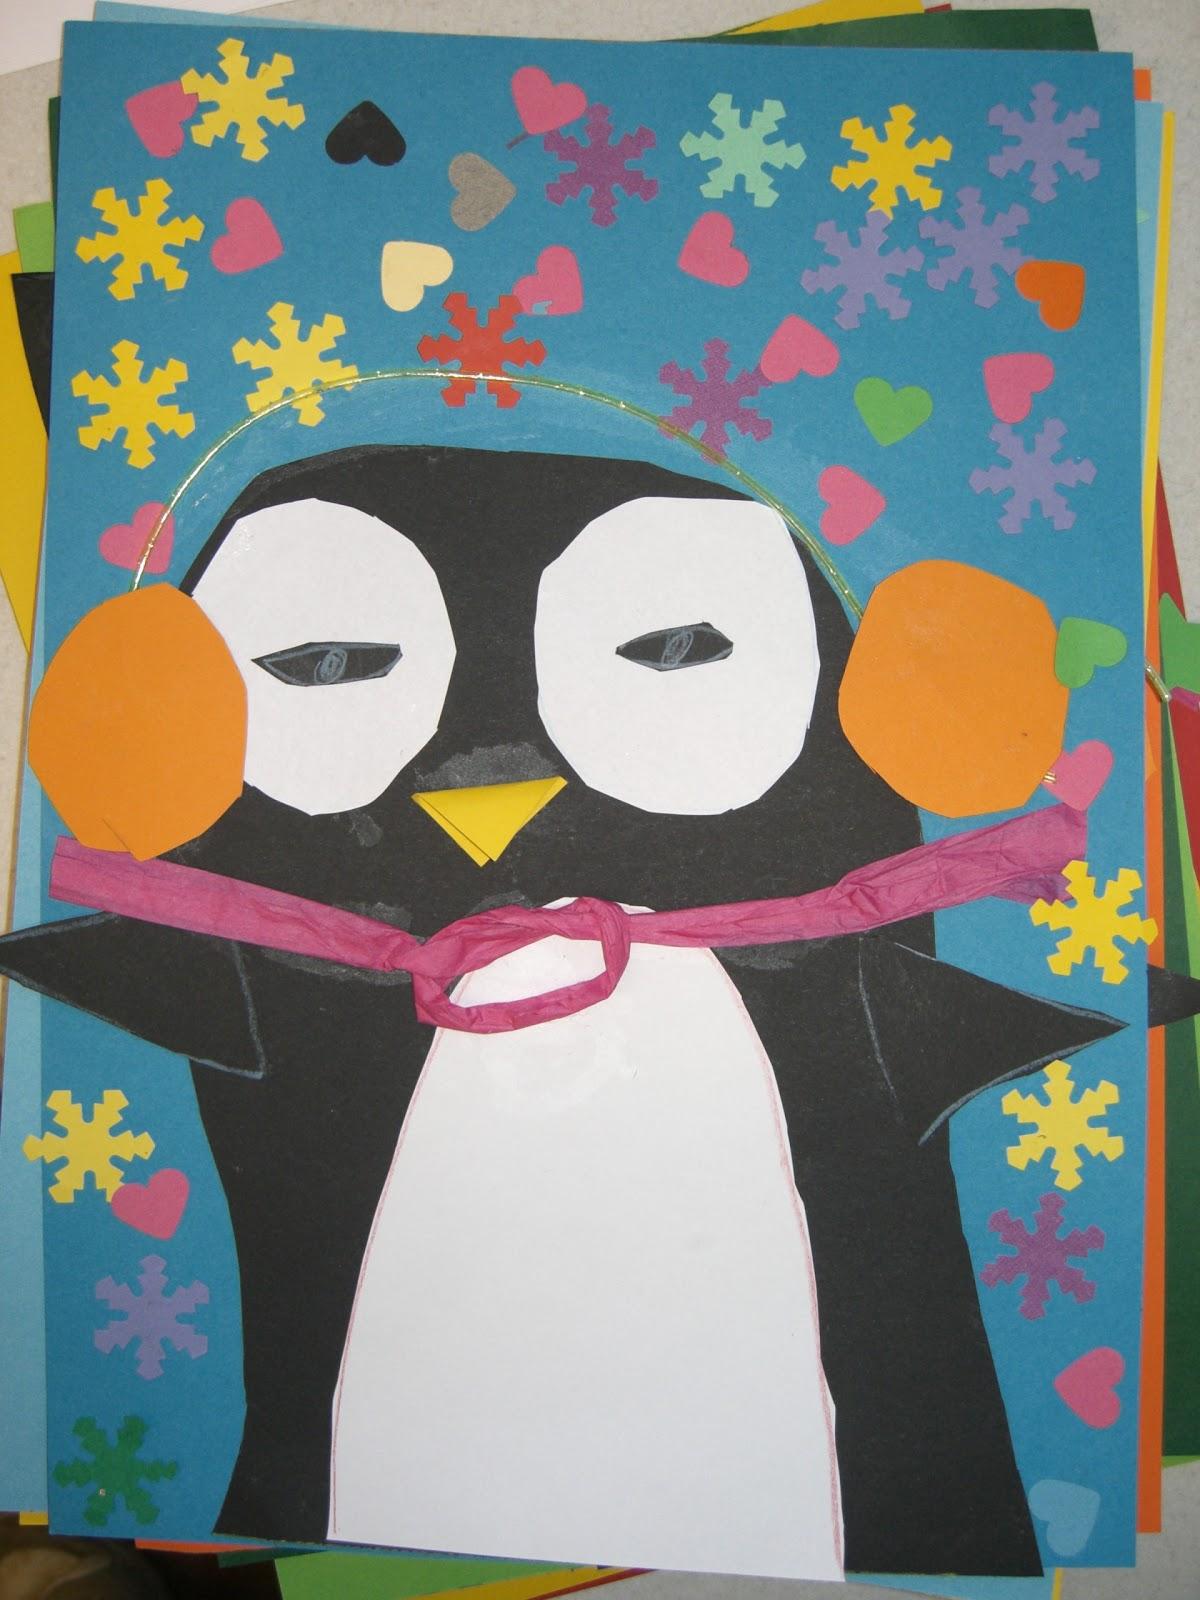 Pinguin-Malerei, Grafik herunterladen Ausmalbilder